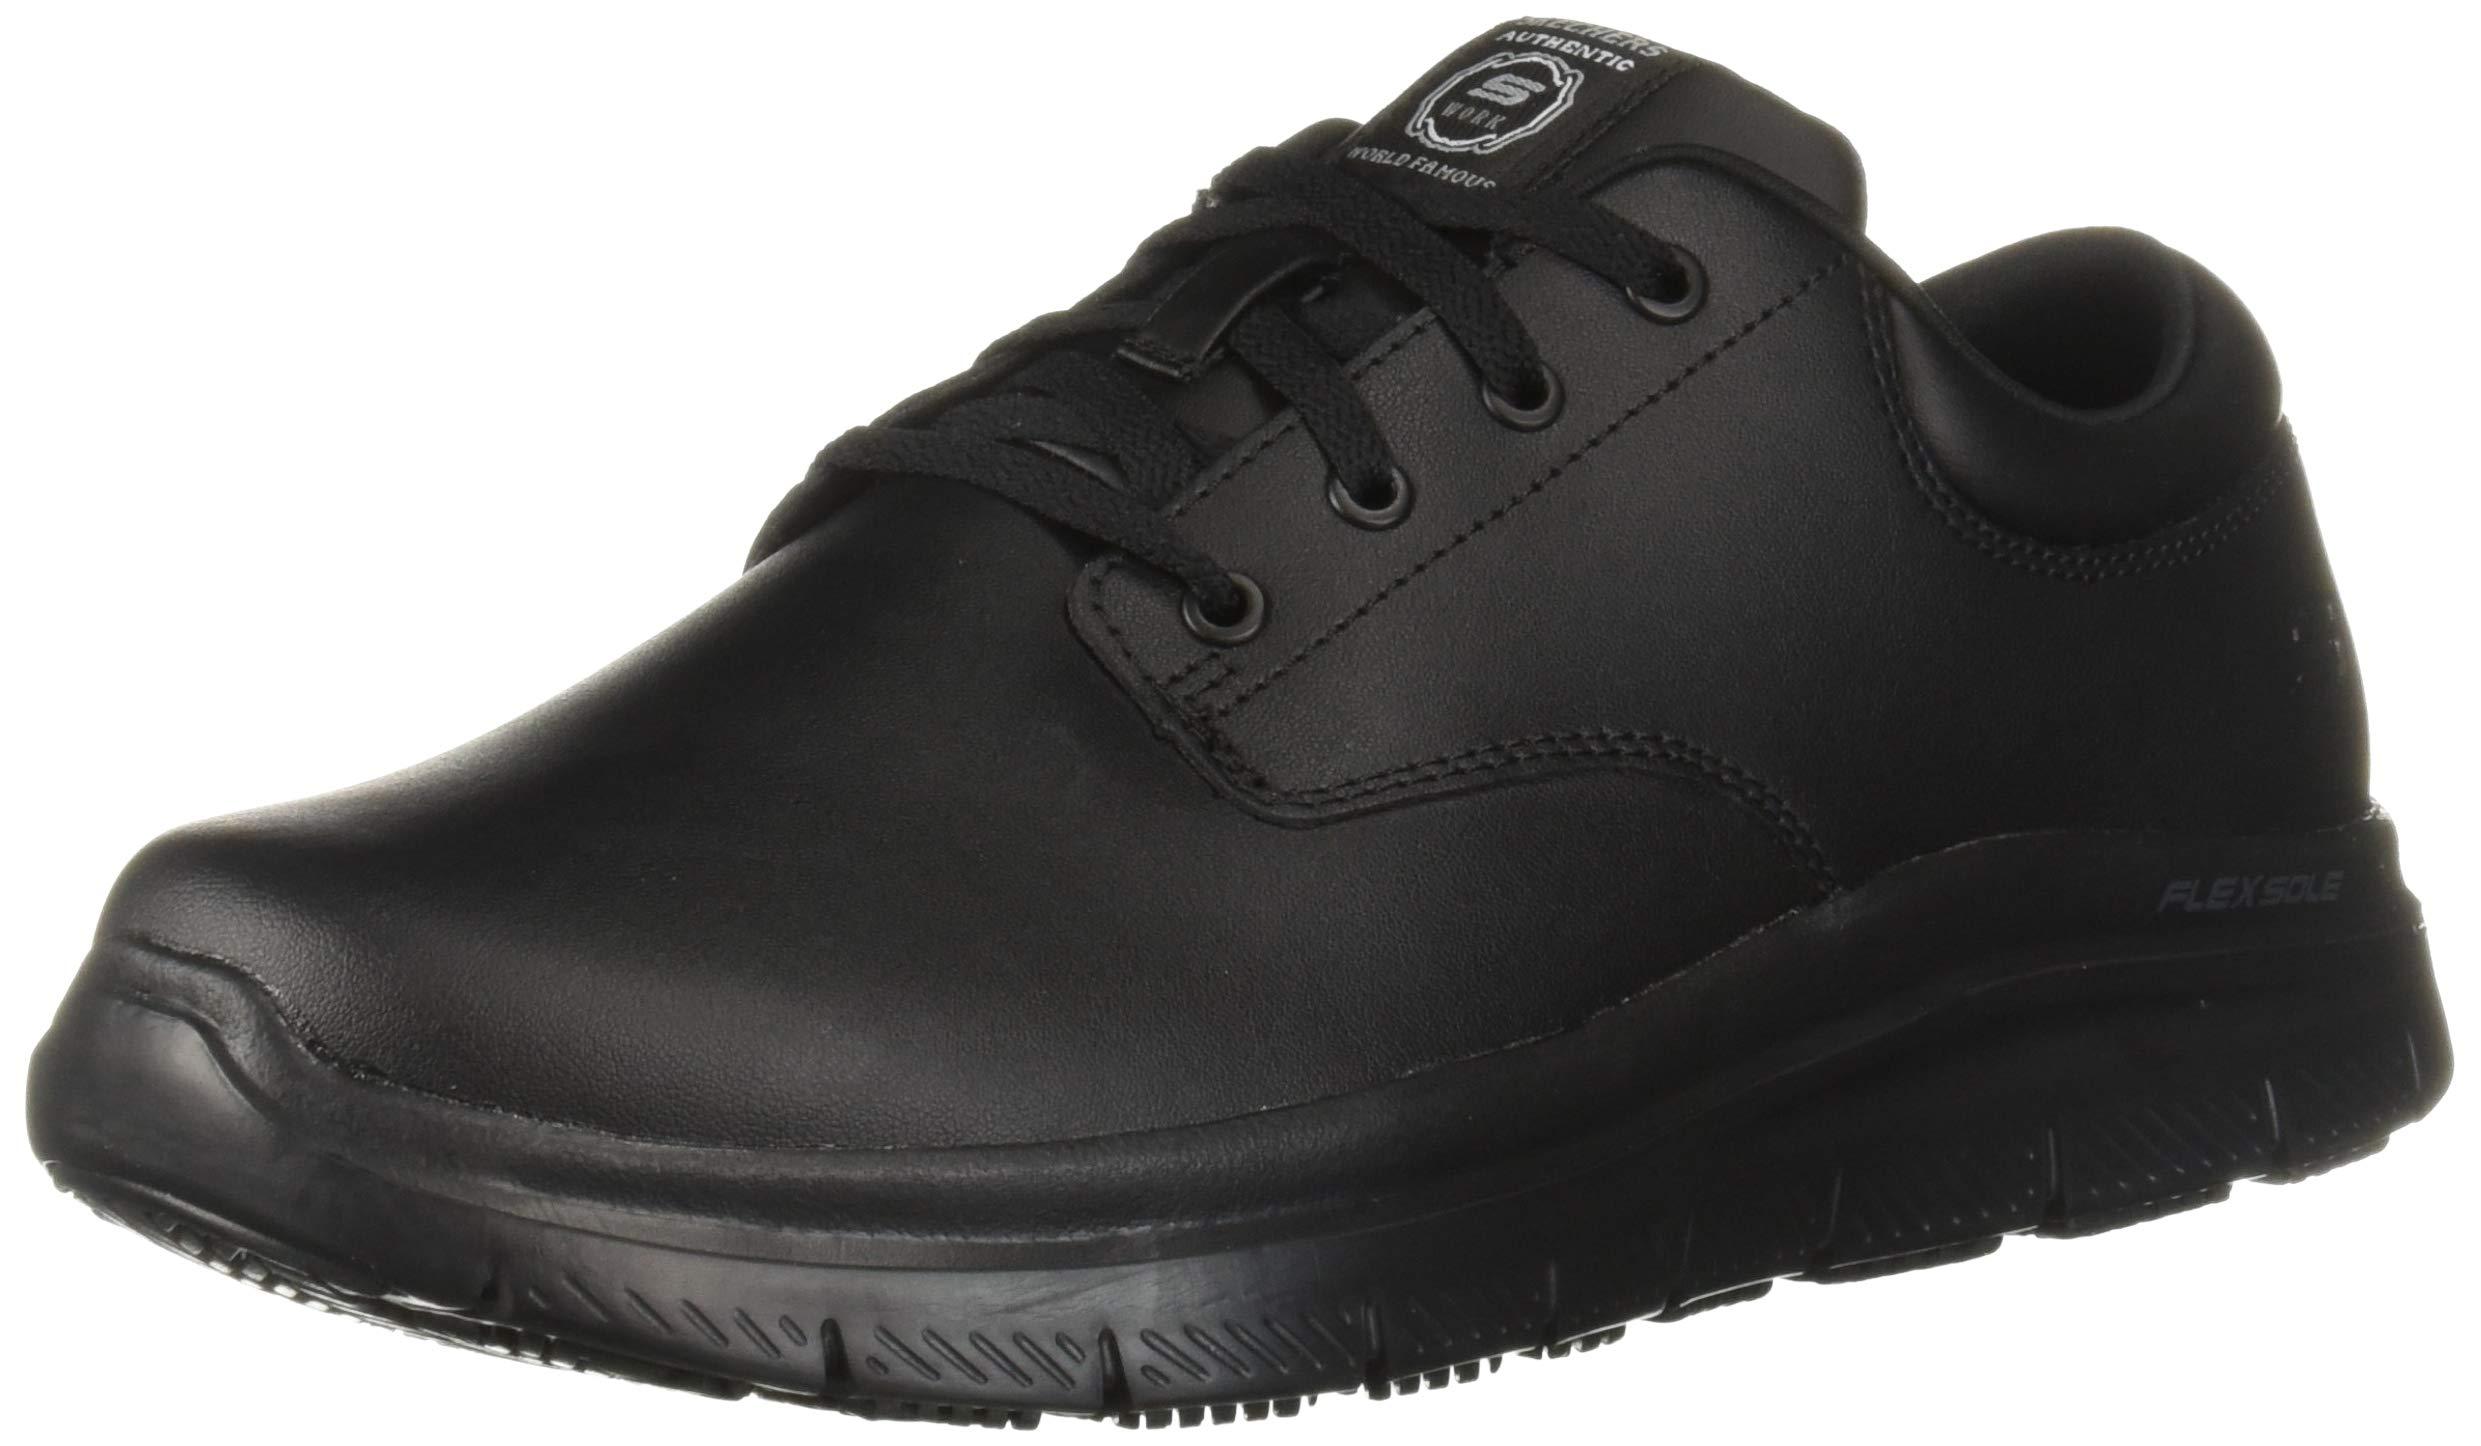 Skechers Men's Flex Advantage SR Fourche Food Service Shoe, Black, 11 M US by Skechers